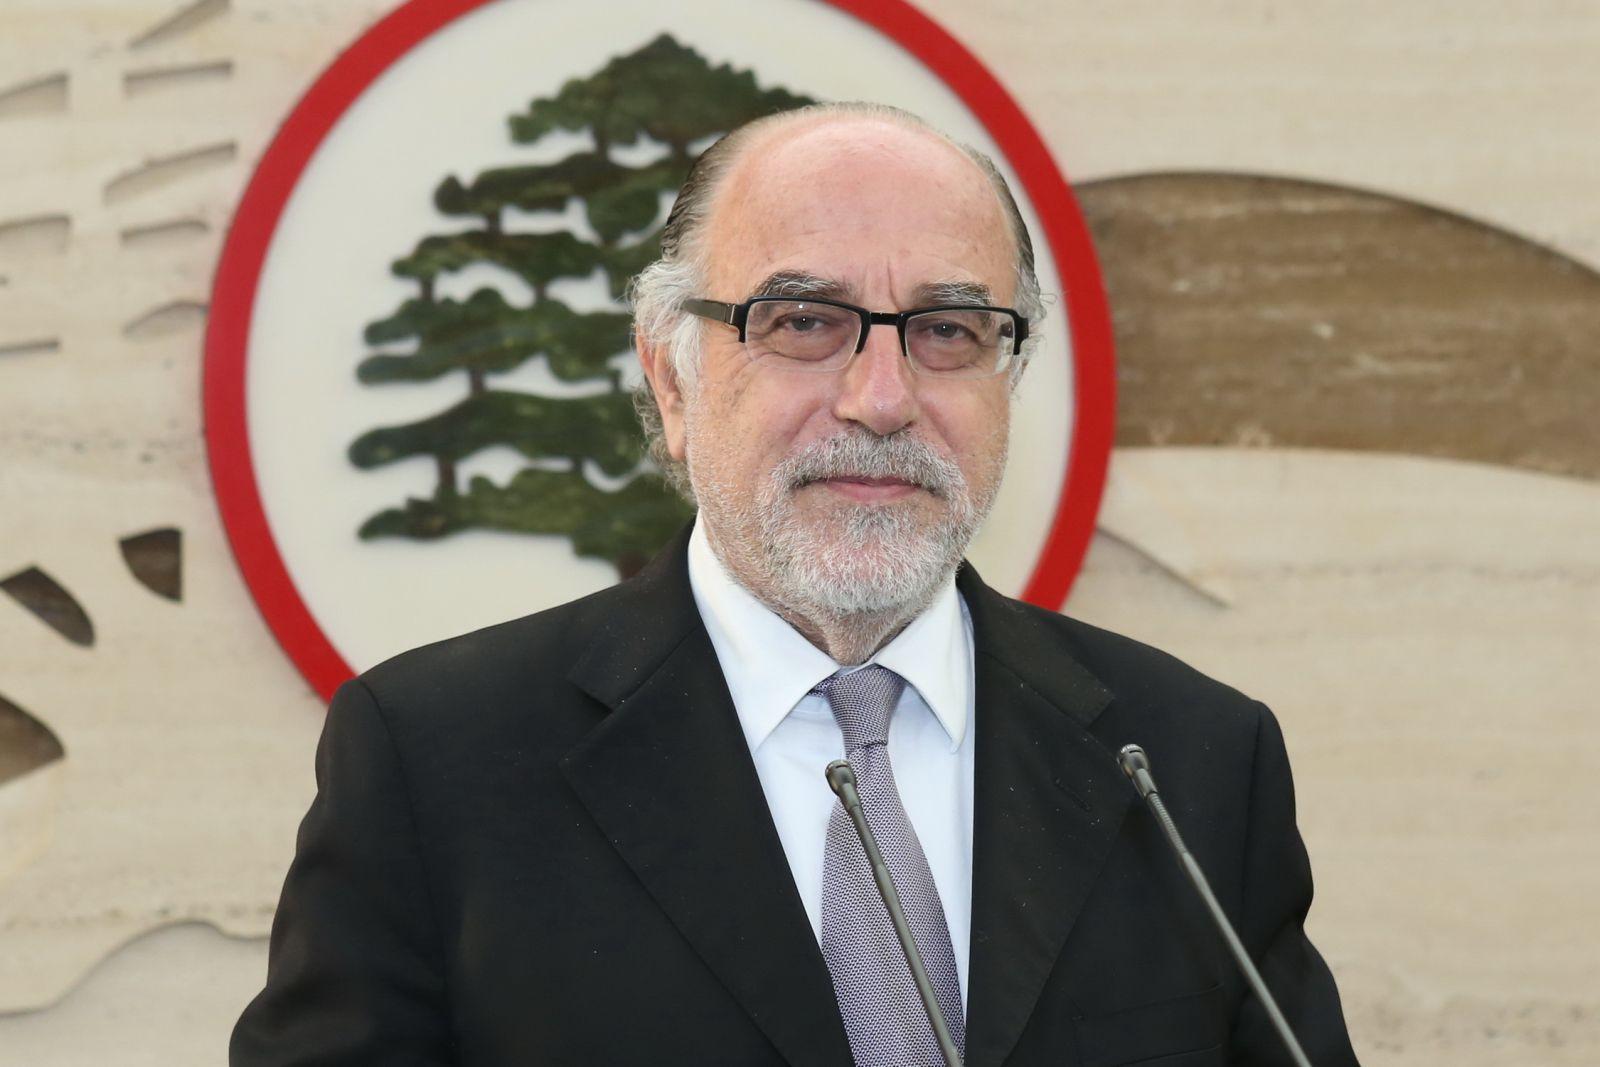 ��� ������ ������� ���� ��� 2013 , ���� ��� ������ �������� ������ ���� ��� 2013